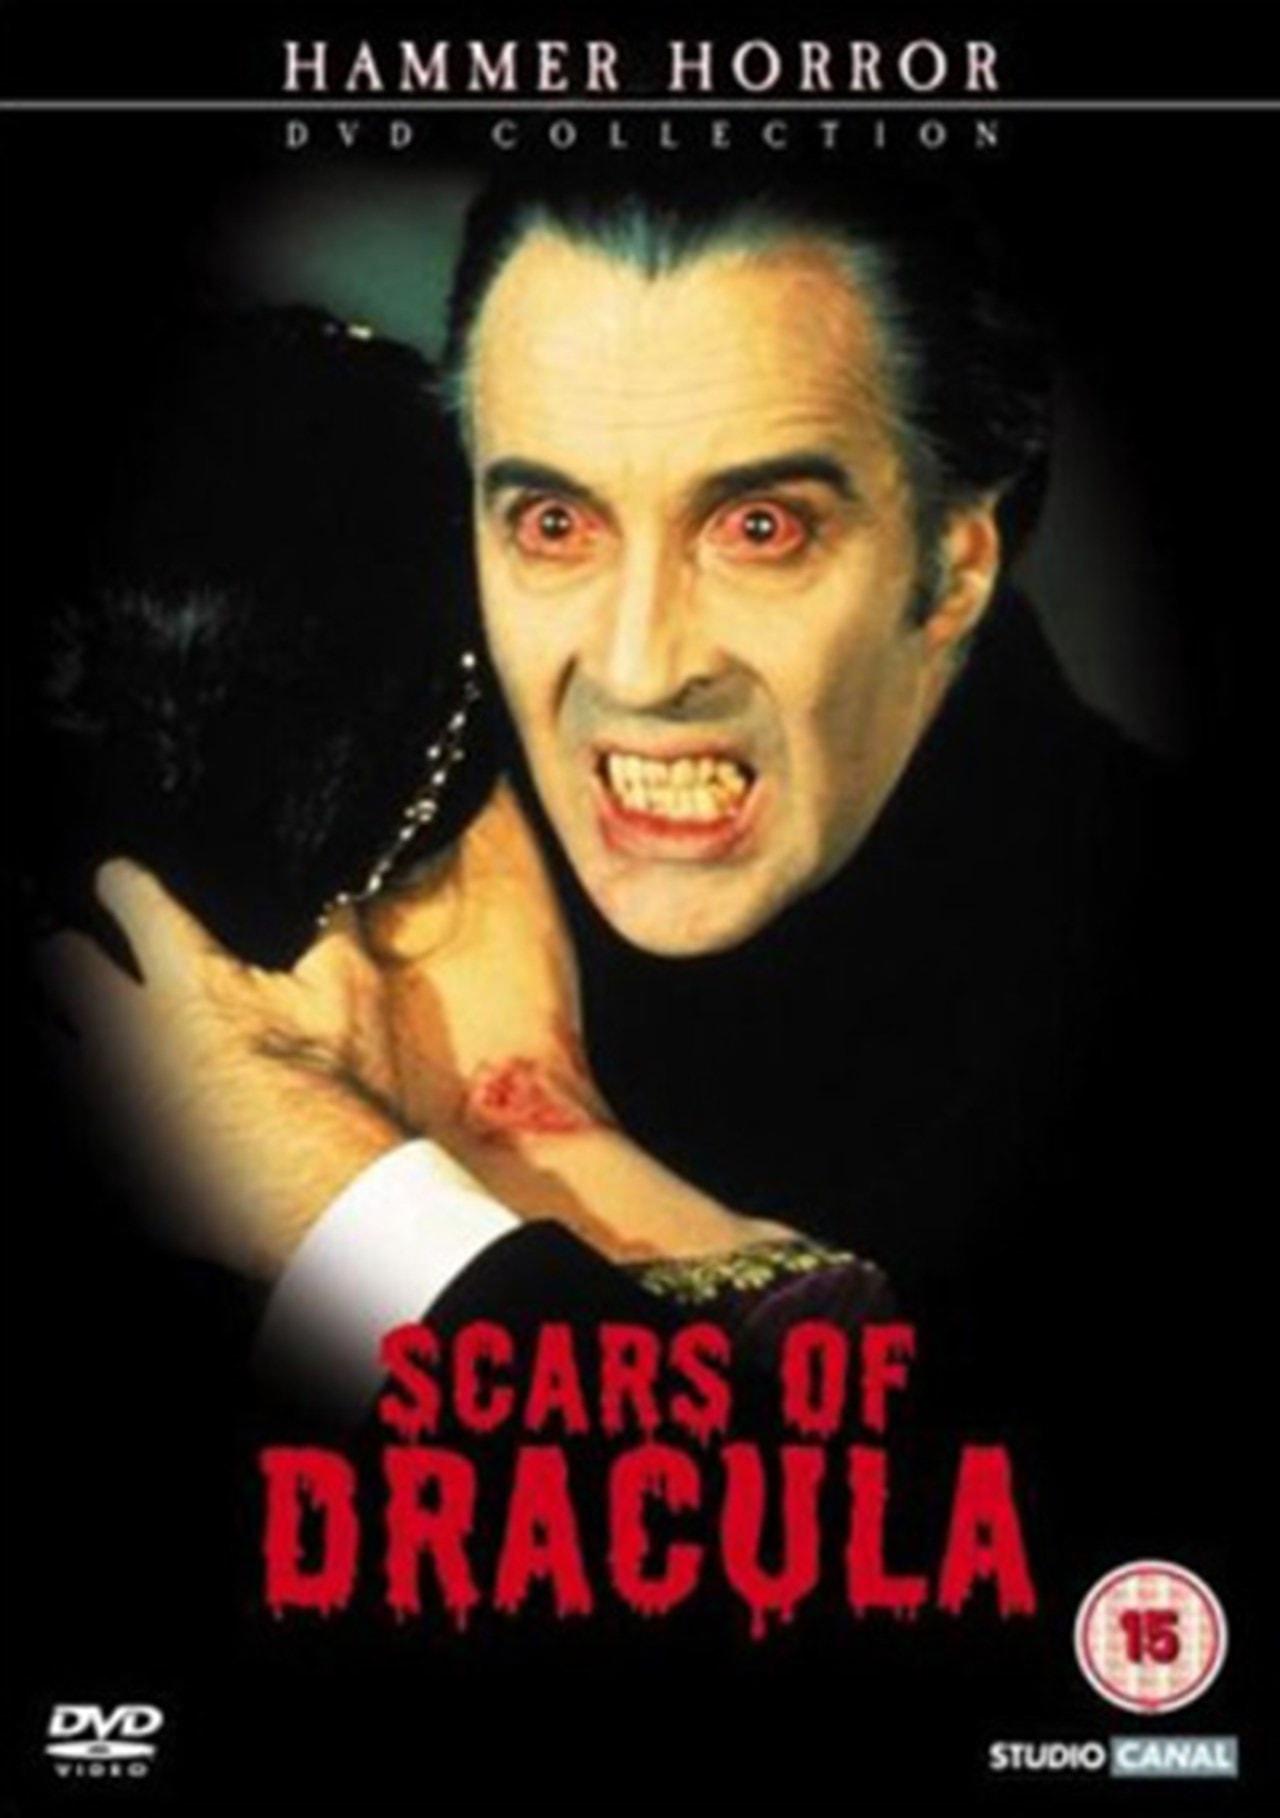 Scars of Dracula - 1